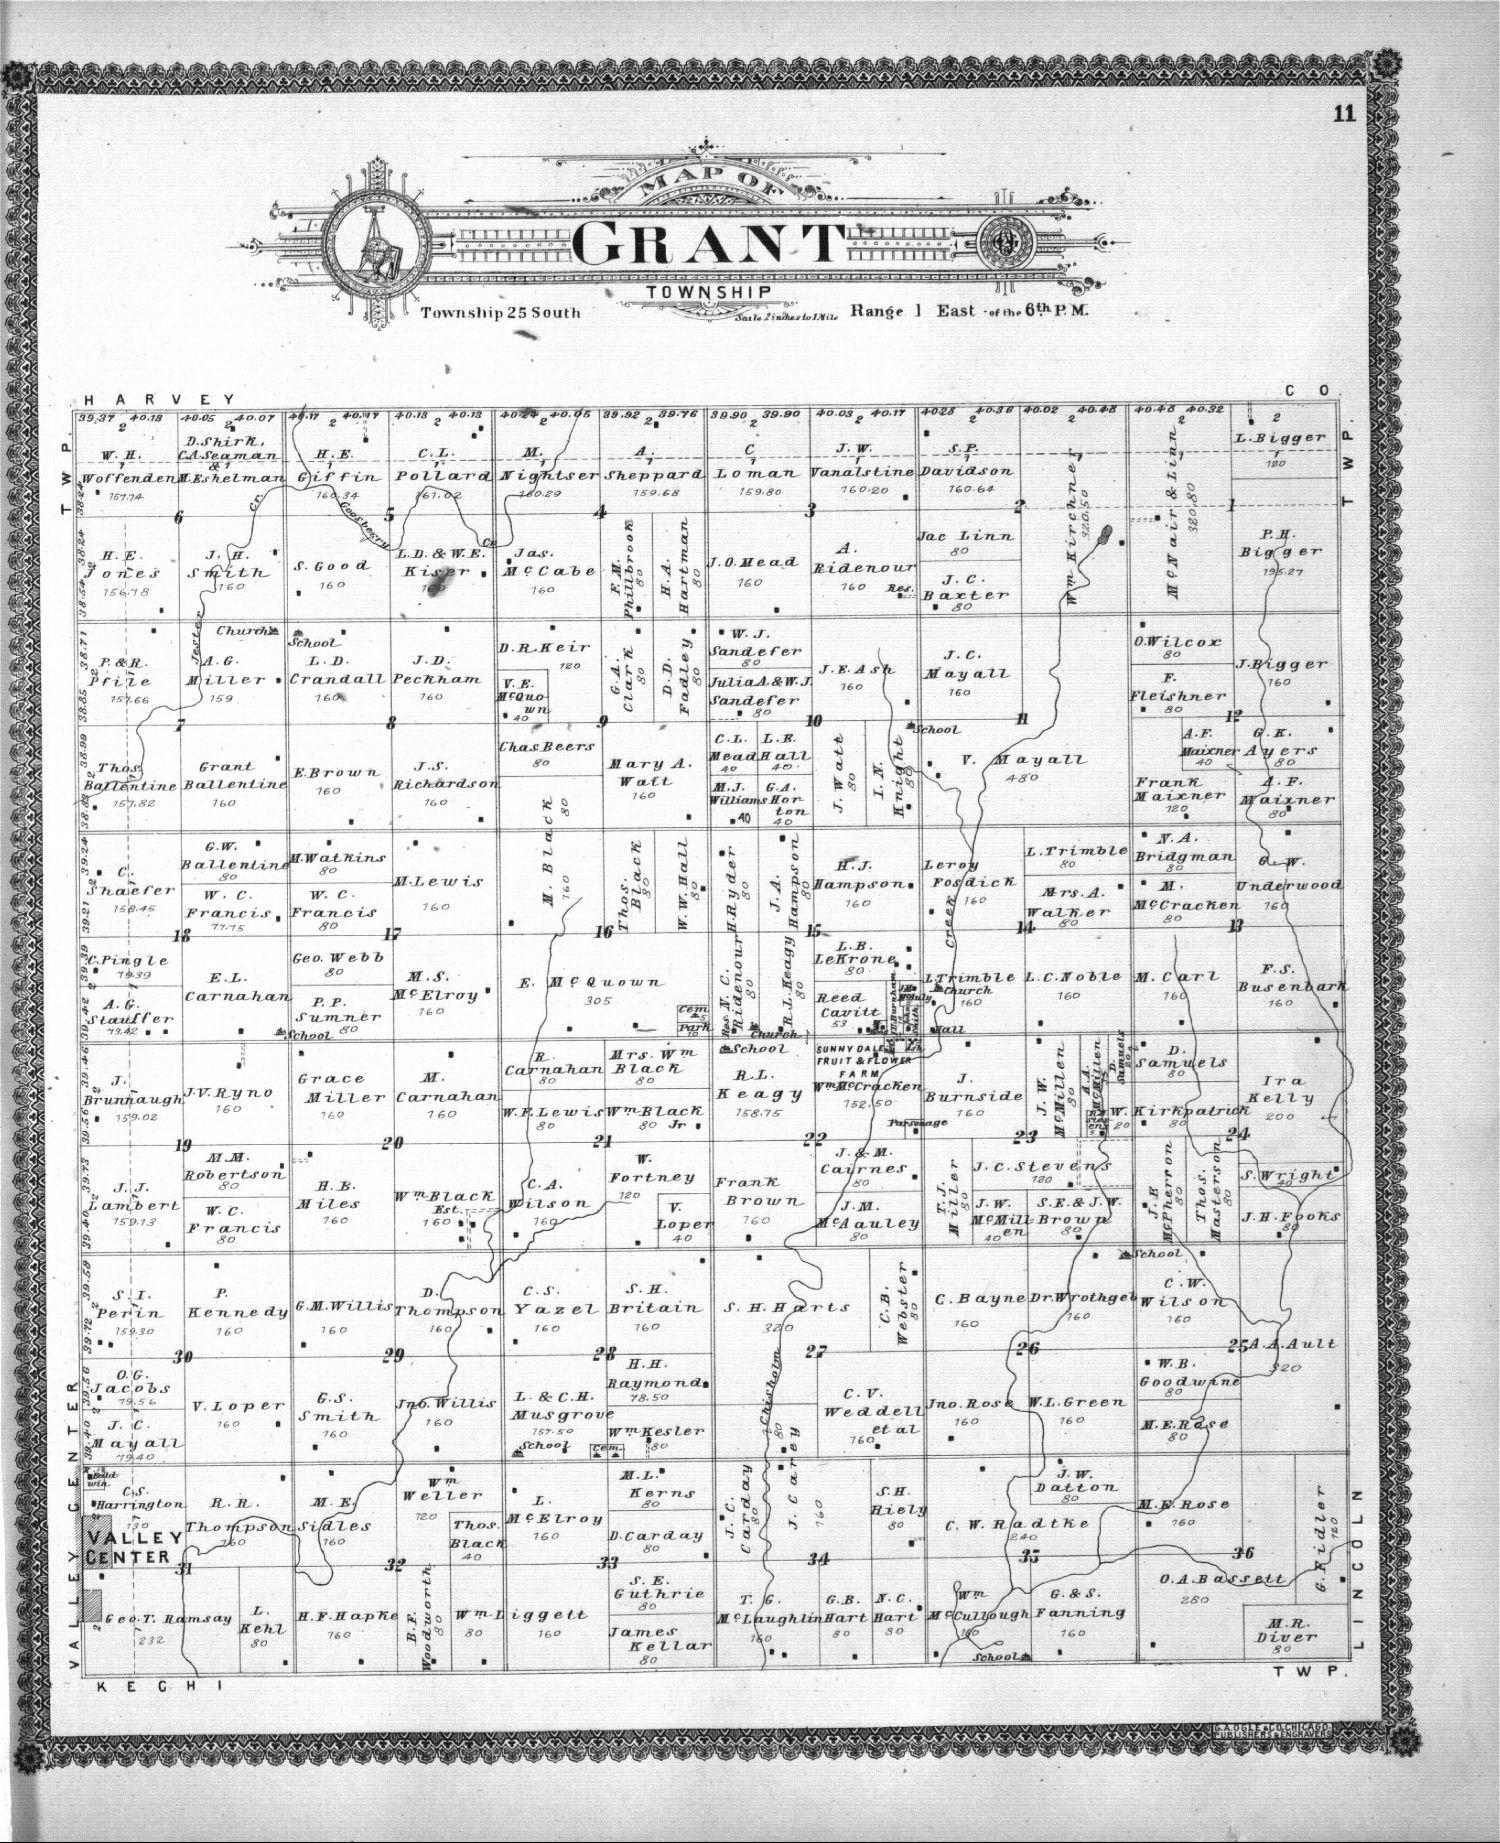 Standard atlas of Sedgwick County, Kansas - 11